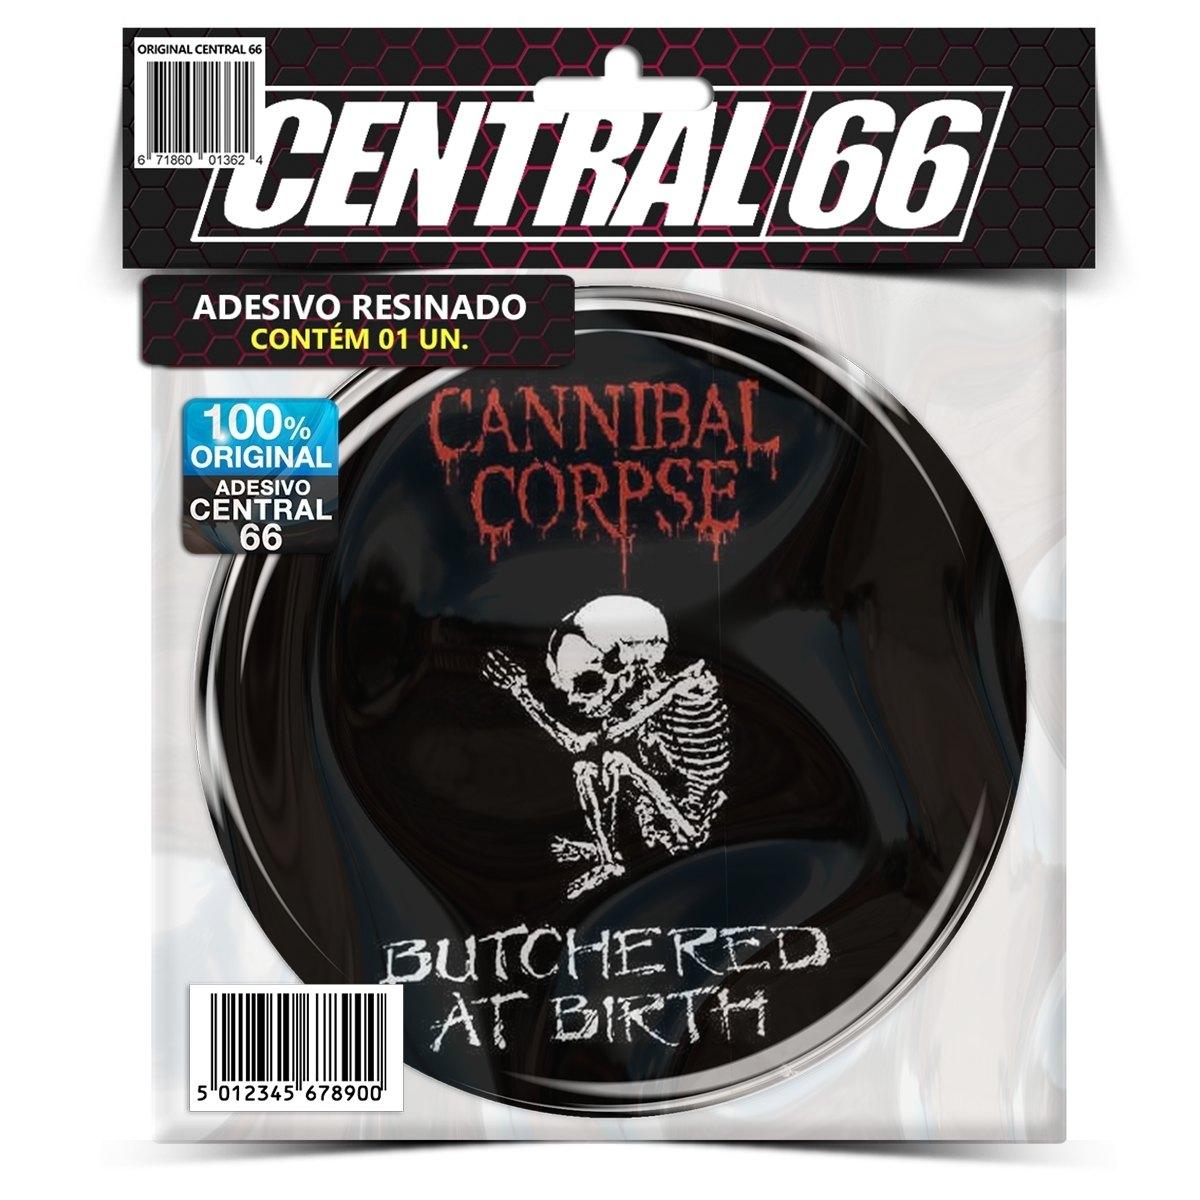 Adesivo Redondo Cannibal Corpse Butchered at Birth M01 – Central 66